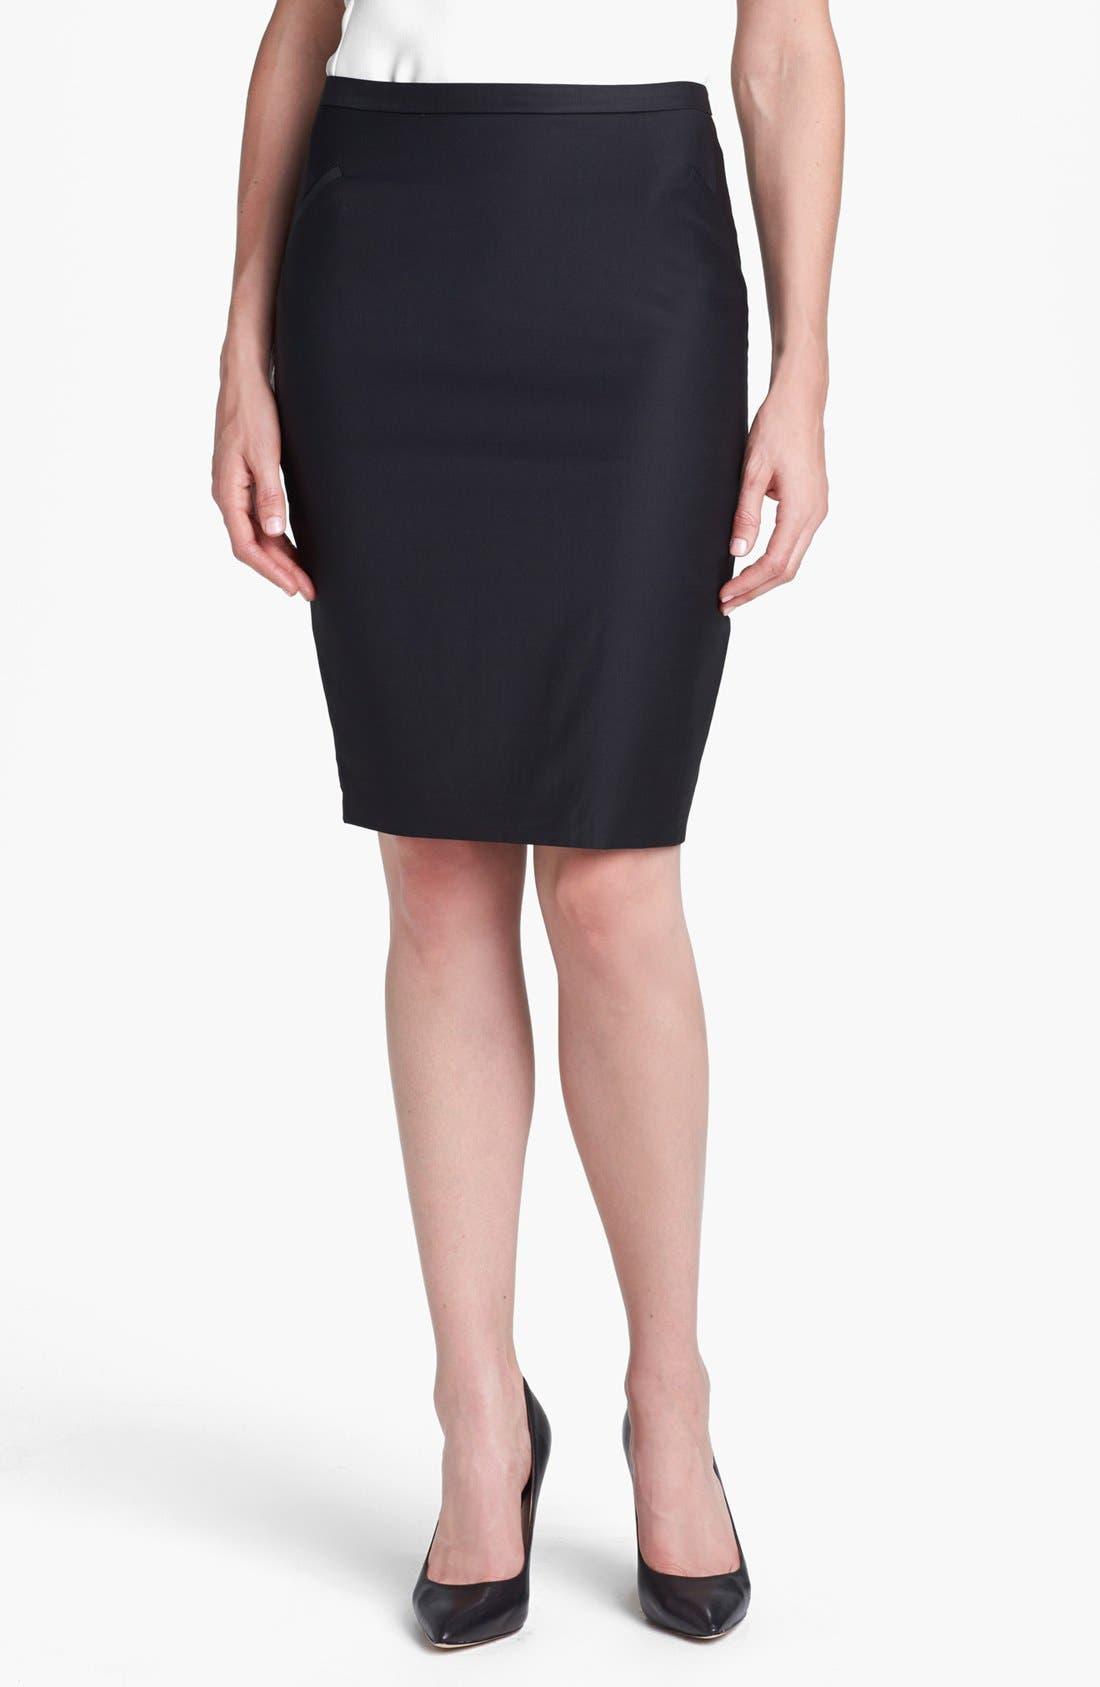 Alternate Image 1 Selected - Ted Baker London 'Shiny Lavanta' Pencil Skirt